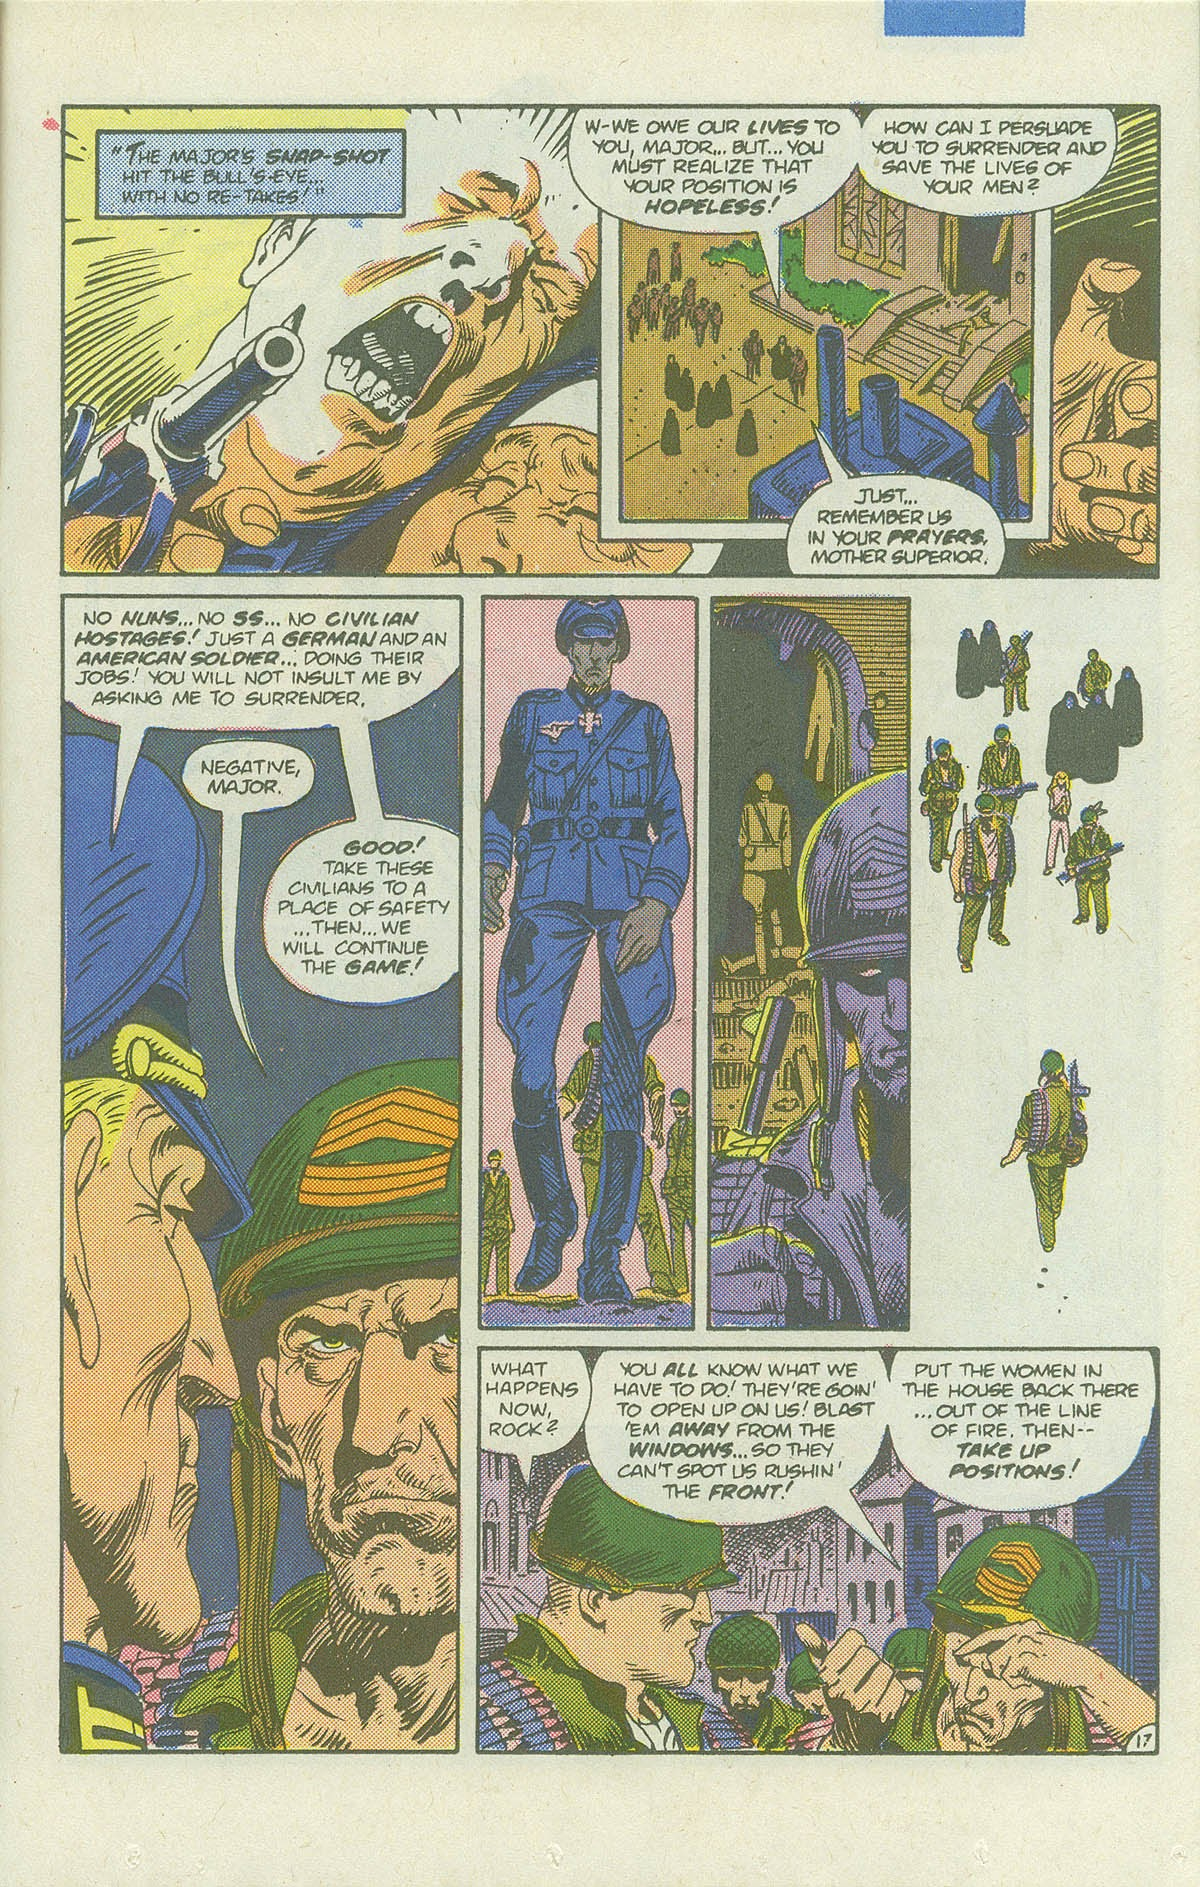 Read online Sgt. Rock comic -  Issue #422 - 24